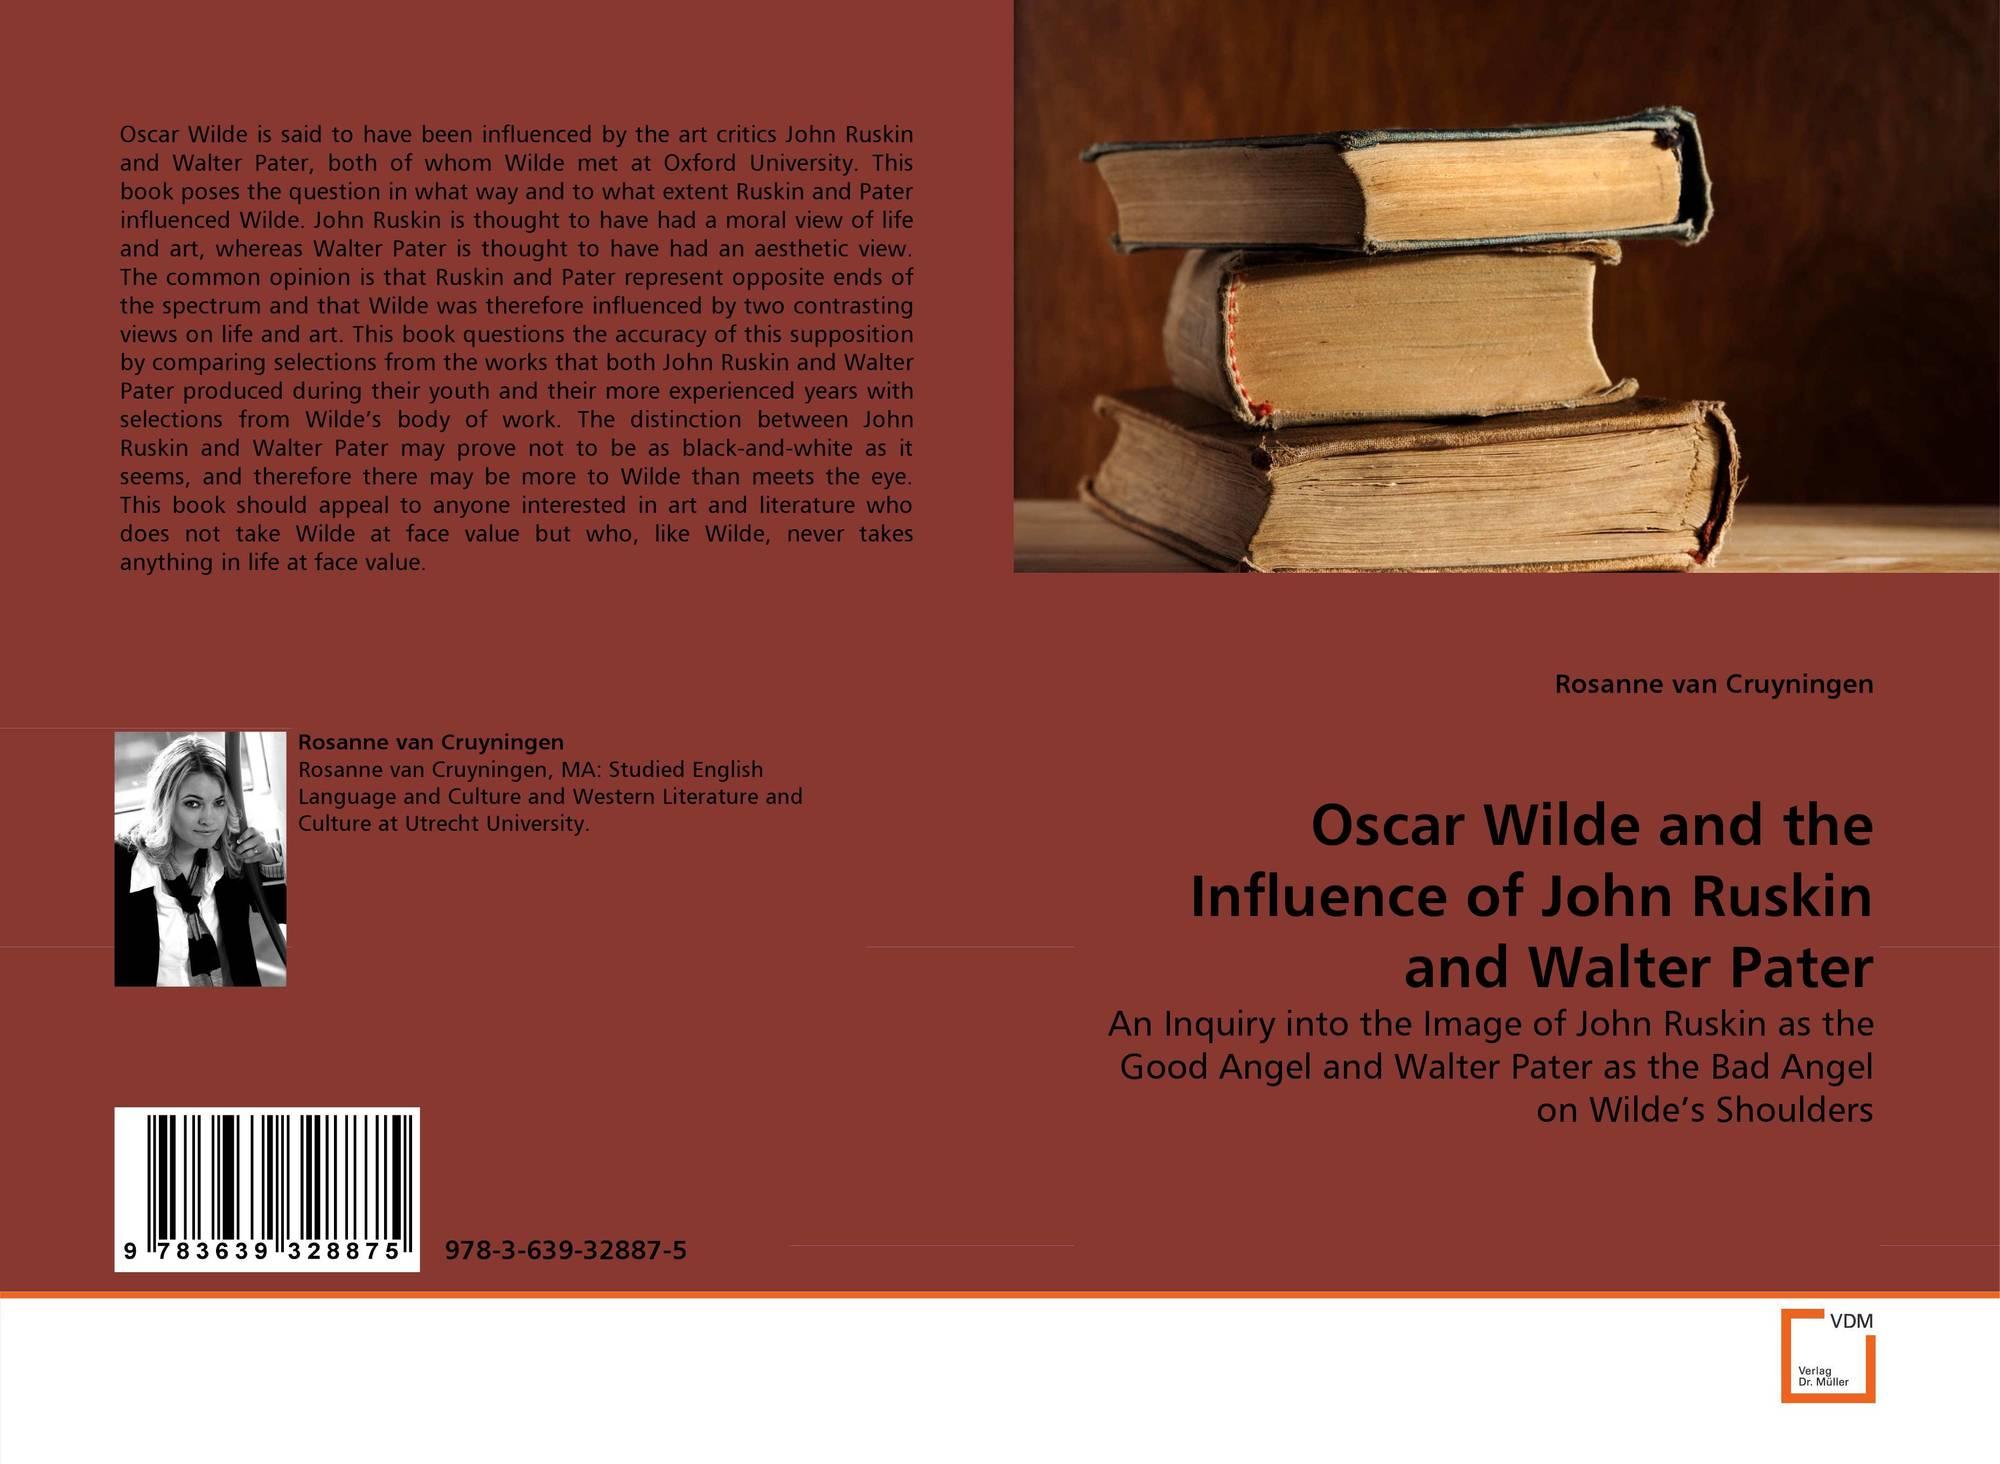 the influences of oscar wilde